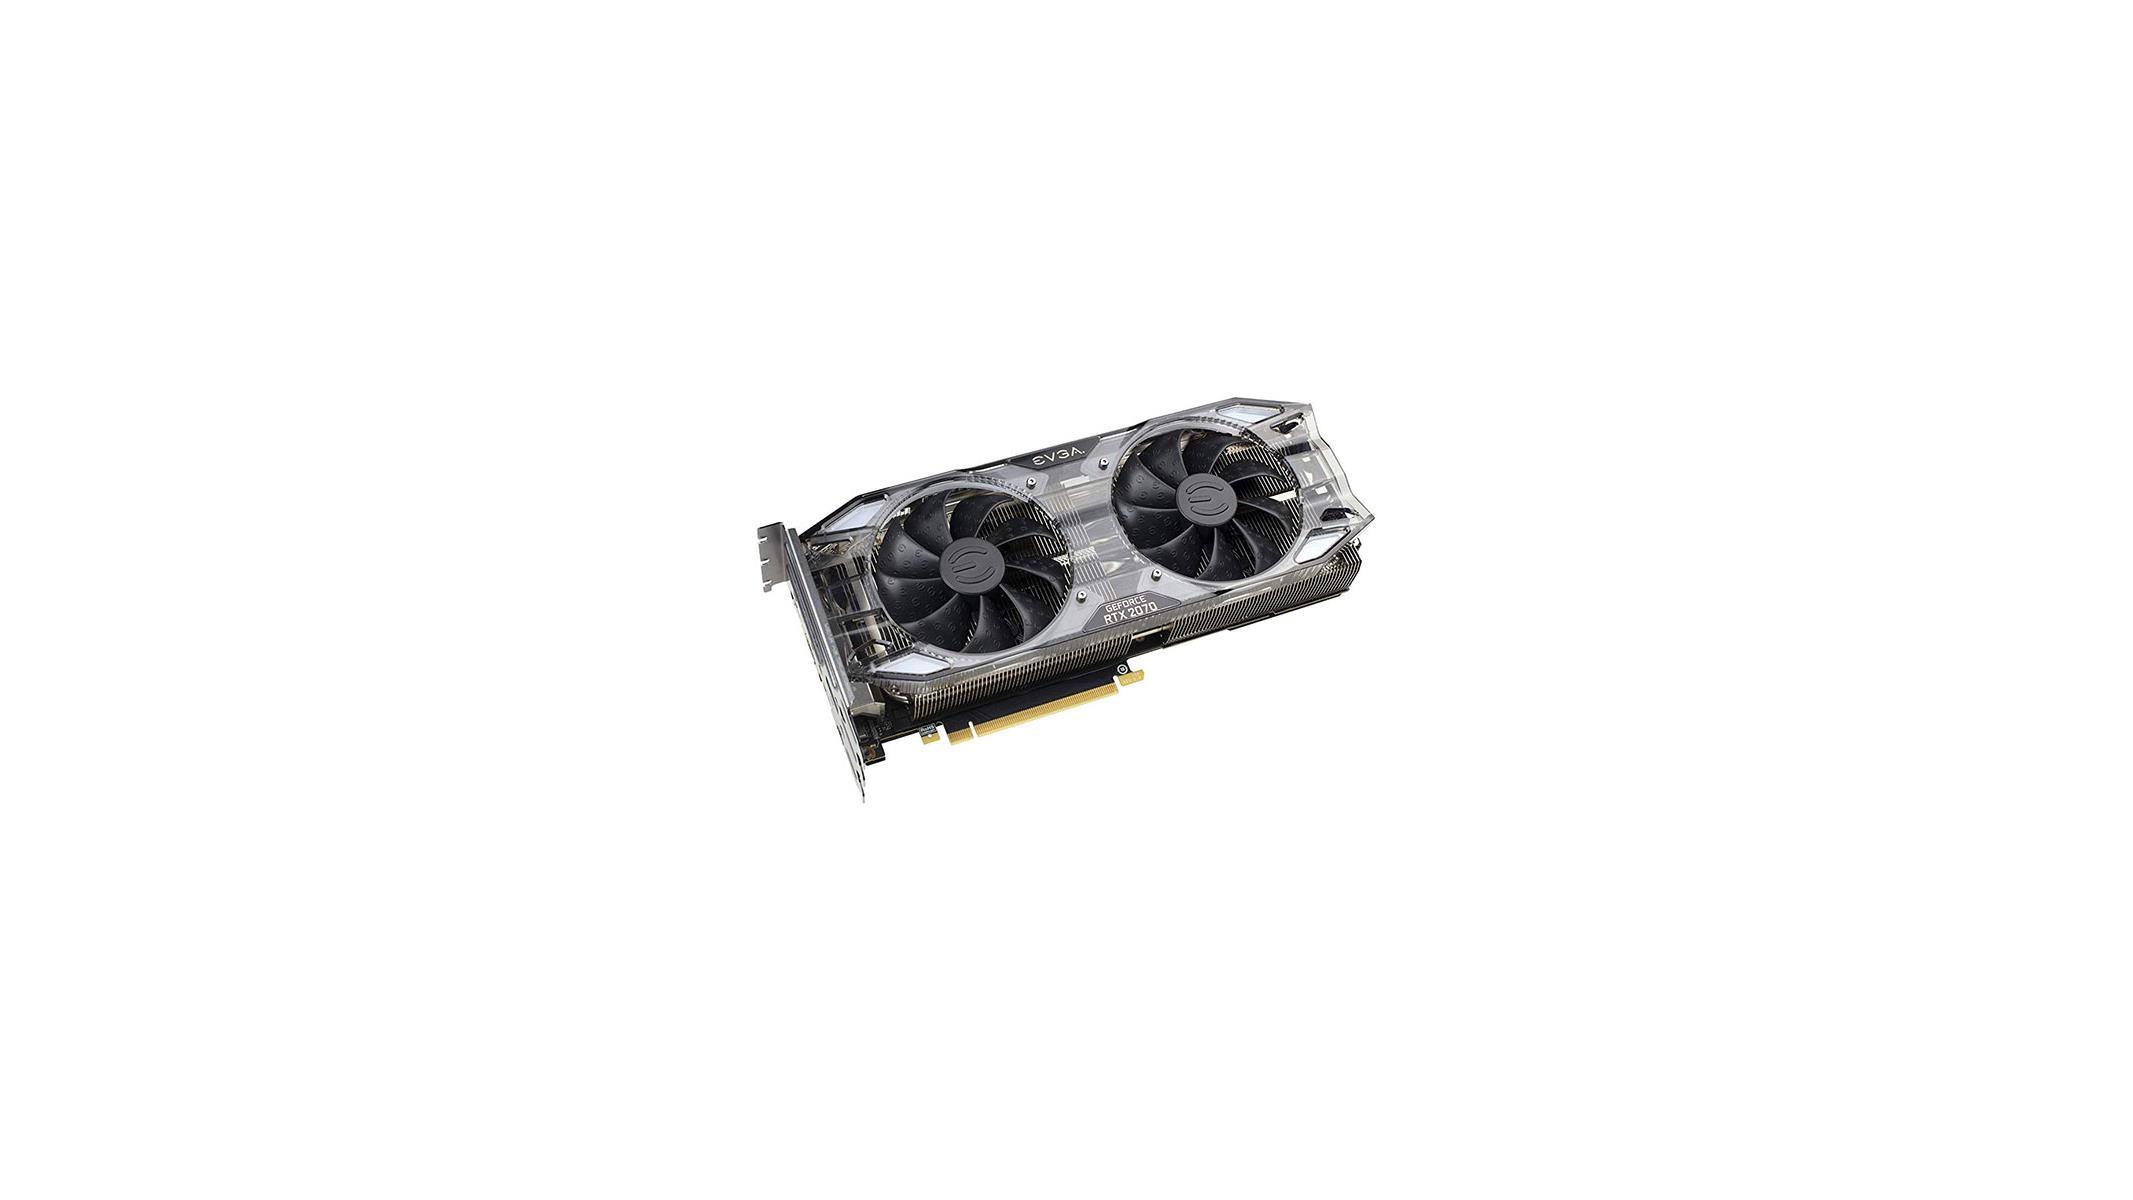 NVIDIA GeForce RTX 2070 Speed Binning Exposed: TU106-400A vs